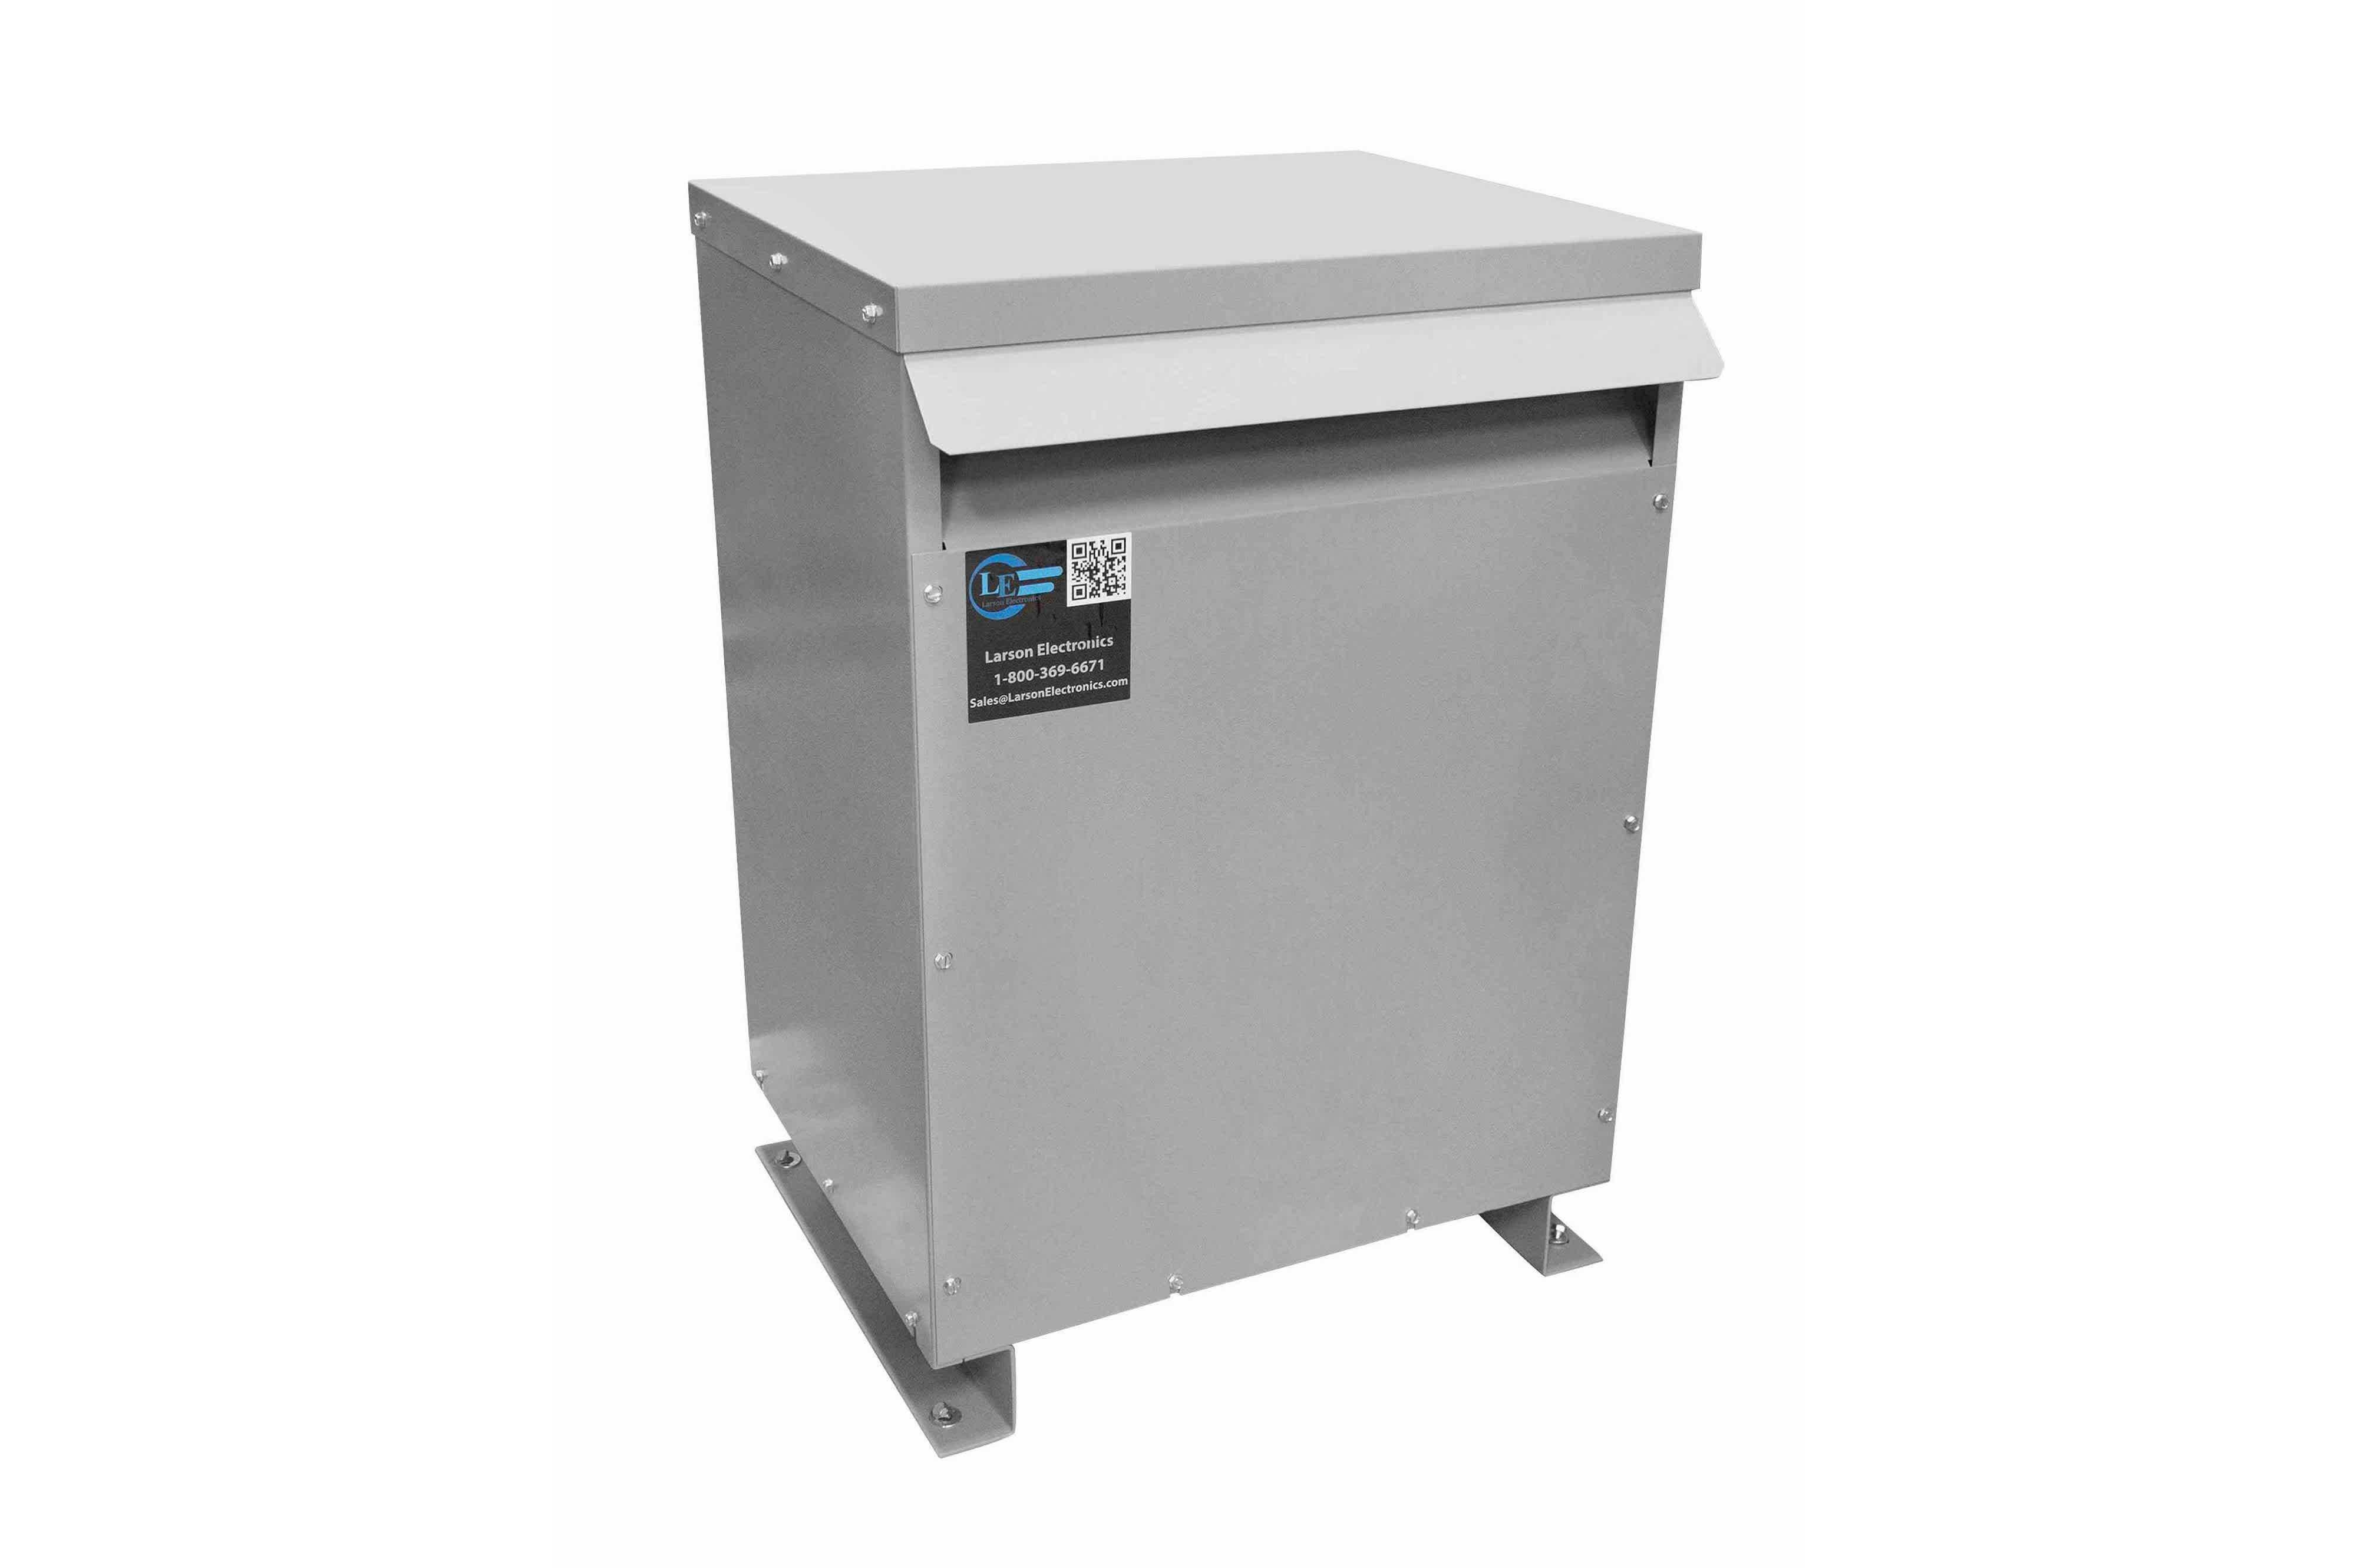 52.5 kVA 3PH Isolation Transformer, 380V Wye Primary, 208Y/120 Wye-N Secondary, N3R, Ventilated, 60 Hz